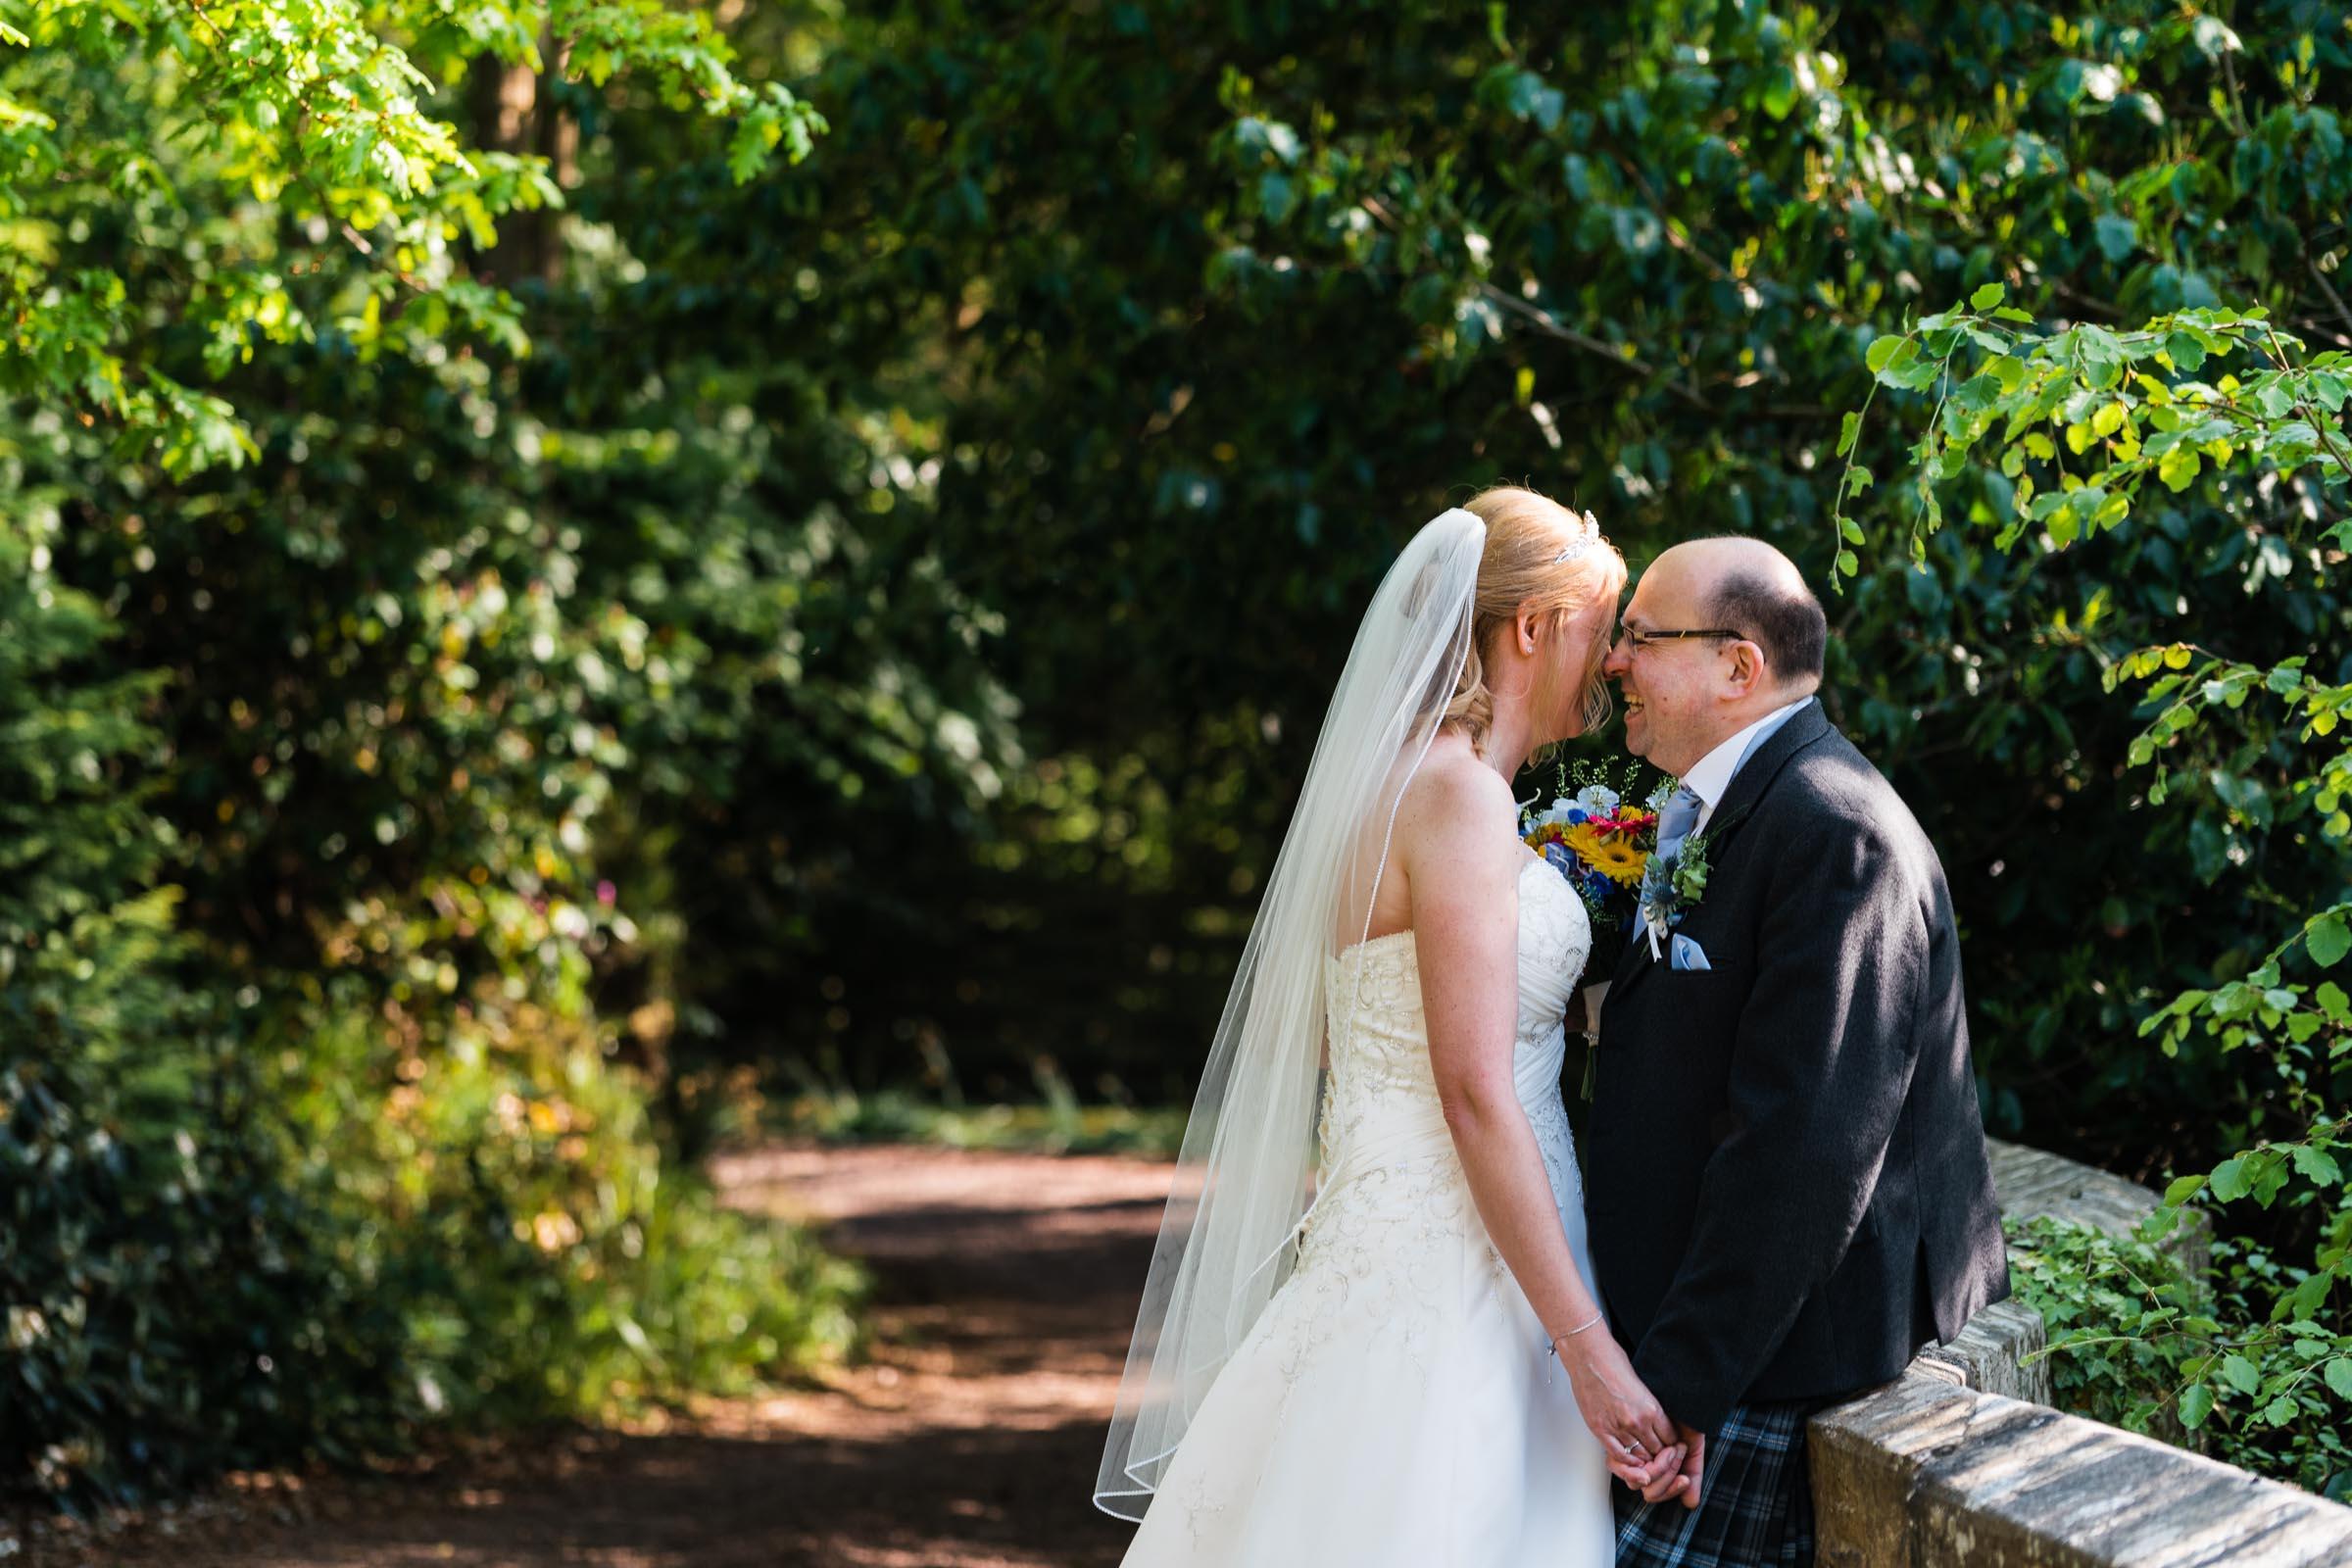 dalhousie-midlothian-wedding-dearlyphotography (7 of 10).jpg